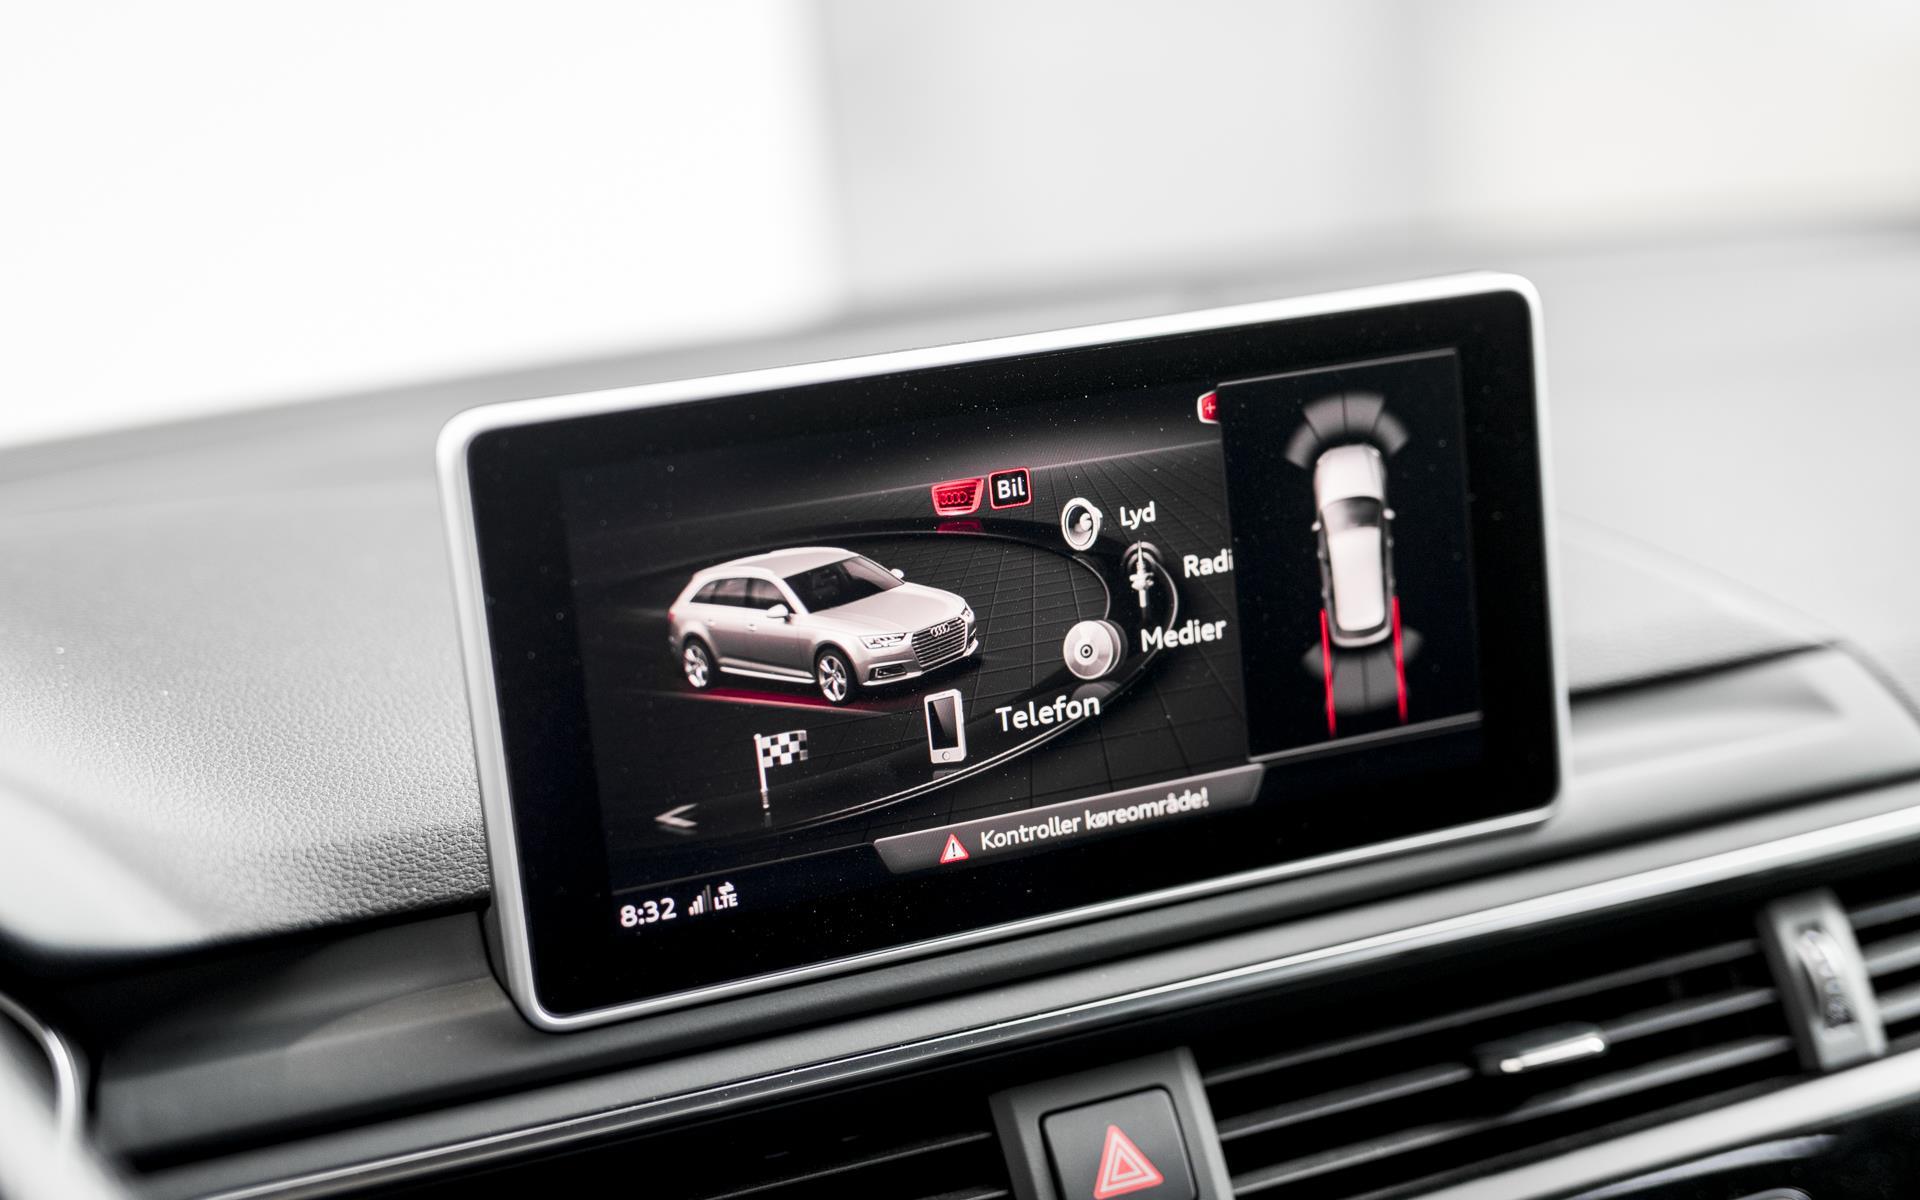 Avant 2,0 TDI S-Line Black Edition TipTronic 190HK Stc  image21